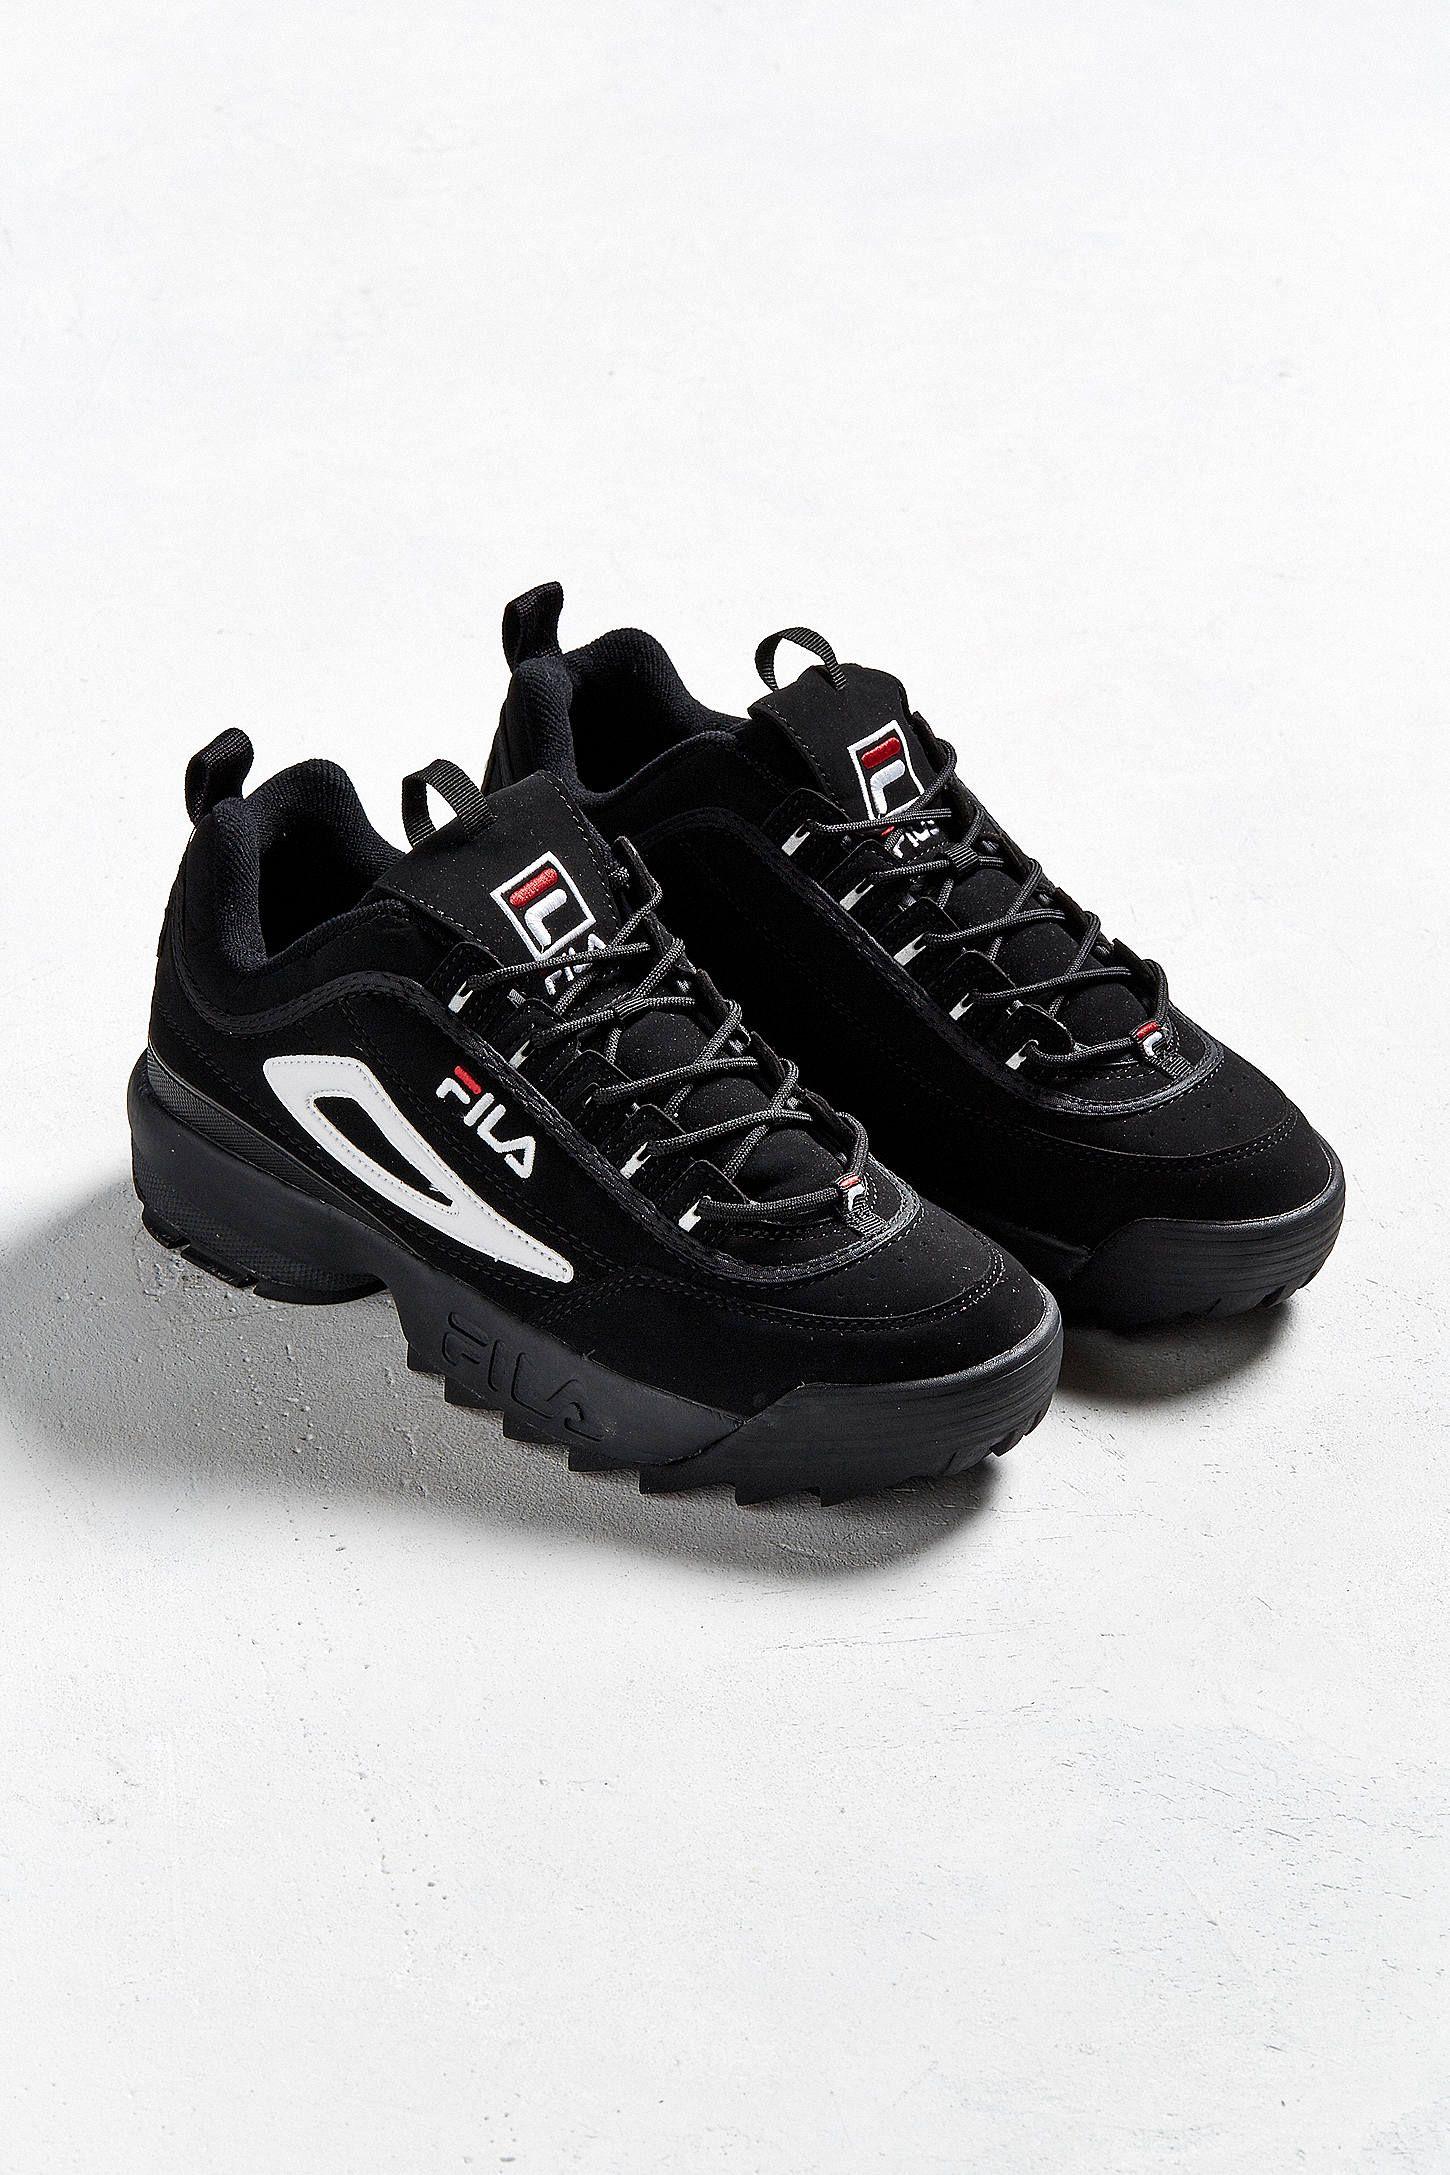 FILA Disruptor 2 Sneaker | Sneakers, Fila disruptors, Shoes